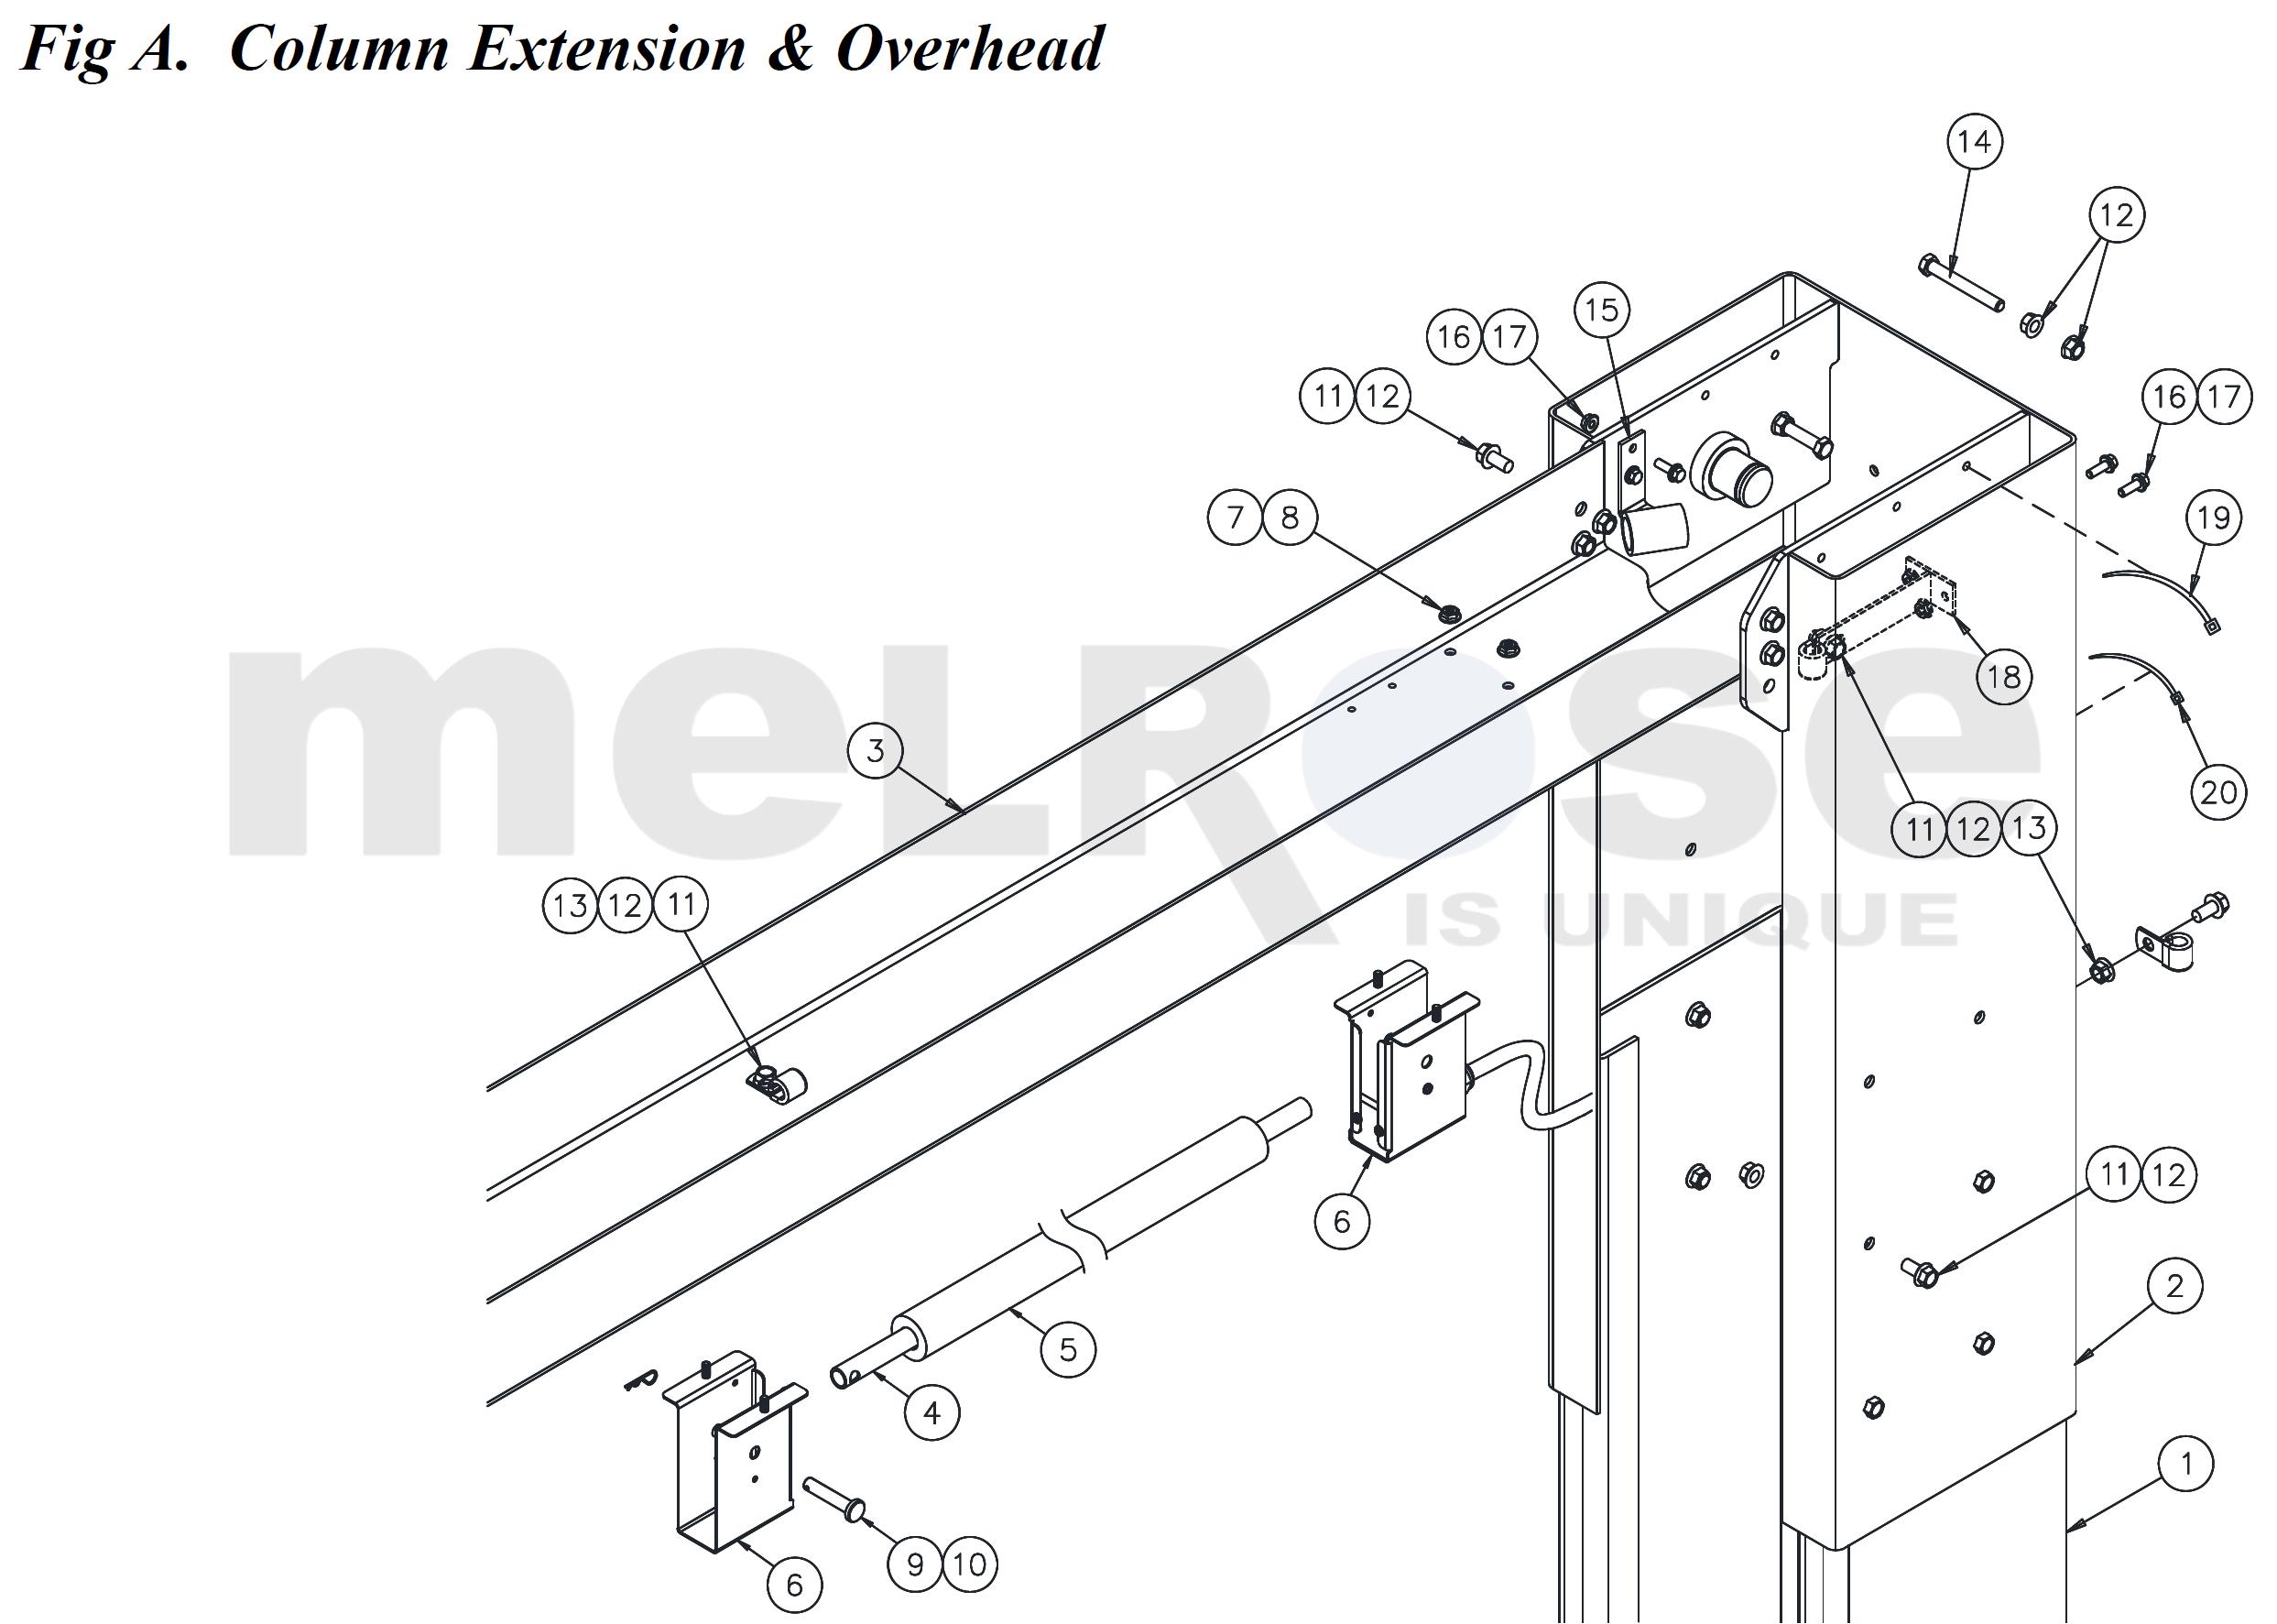 cl12-a.-column-extension-overhead-marked.jpg